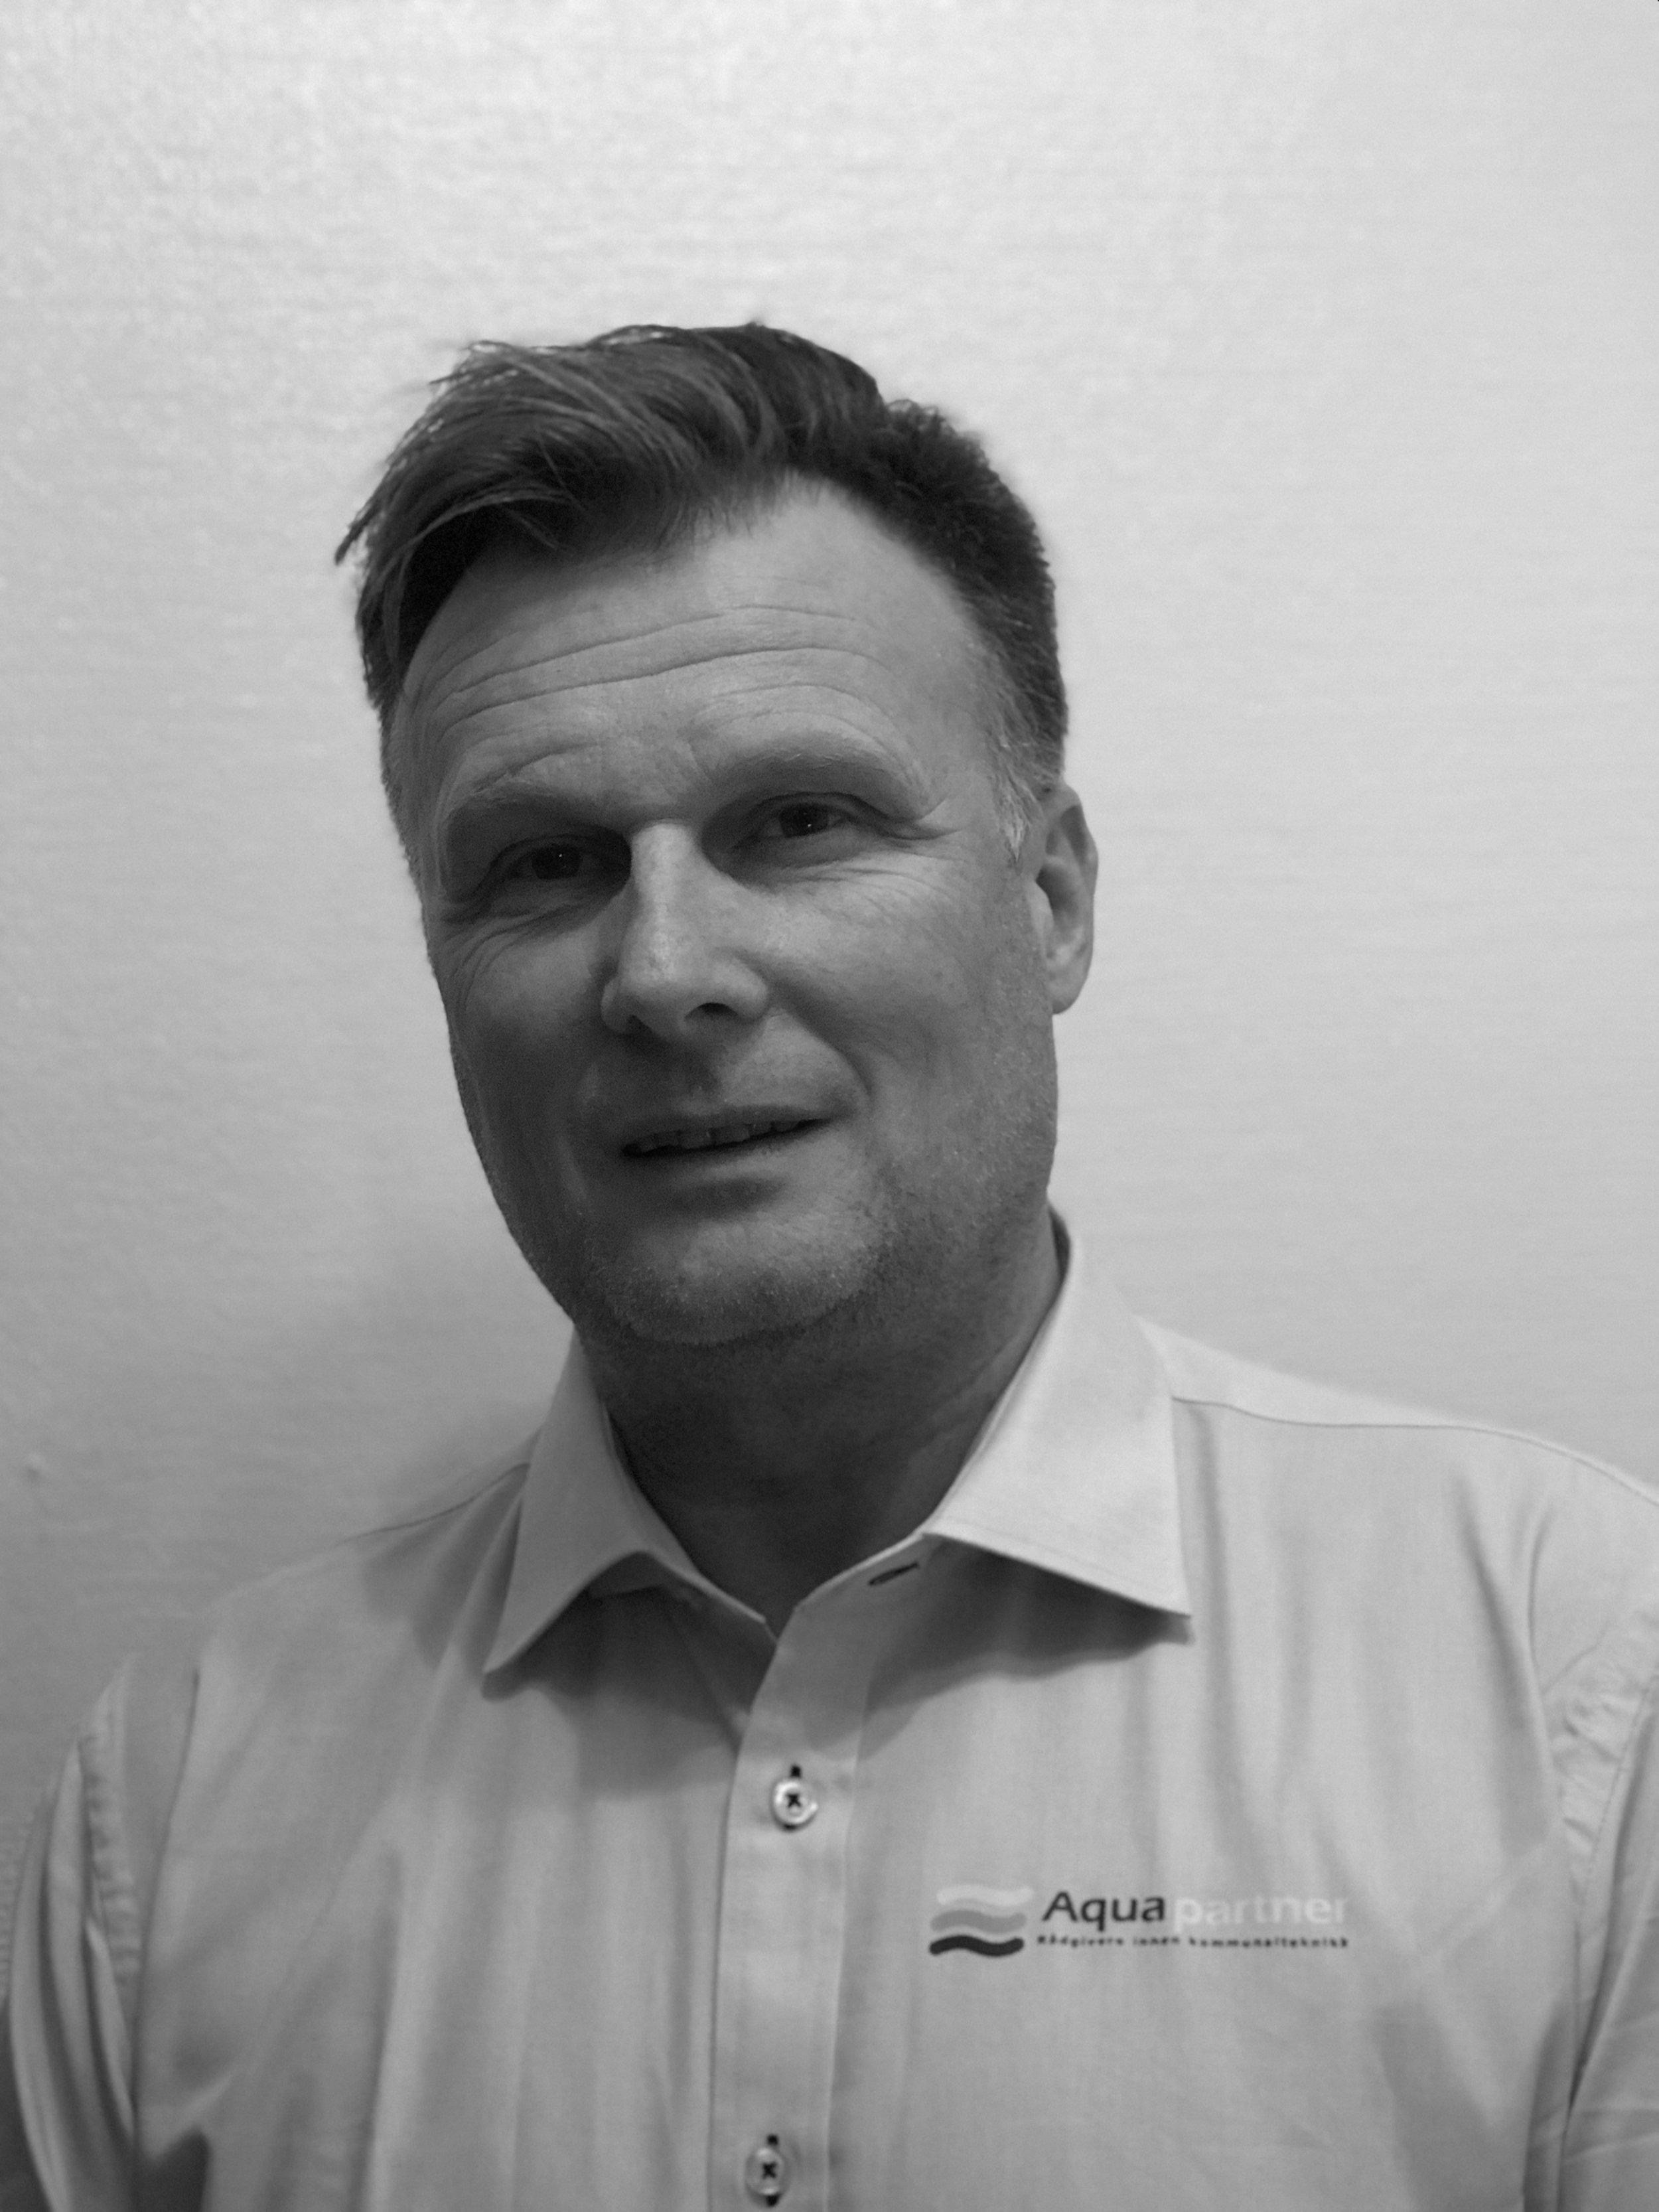 Bjørn Ove Persgård